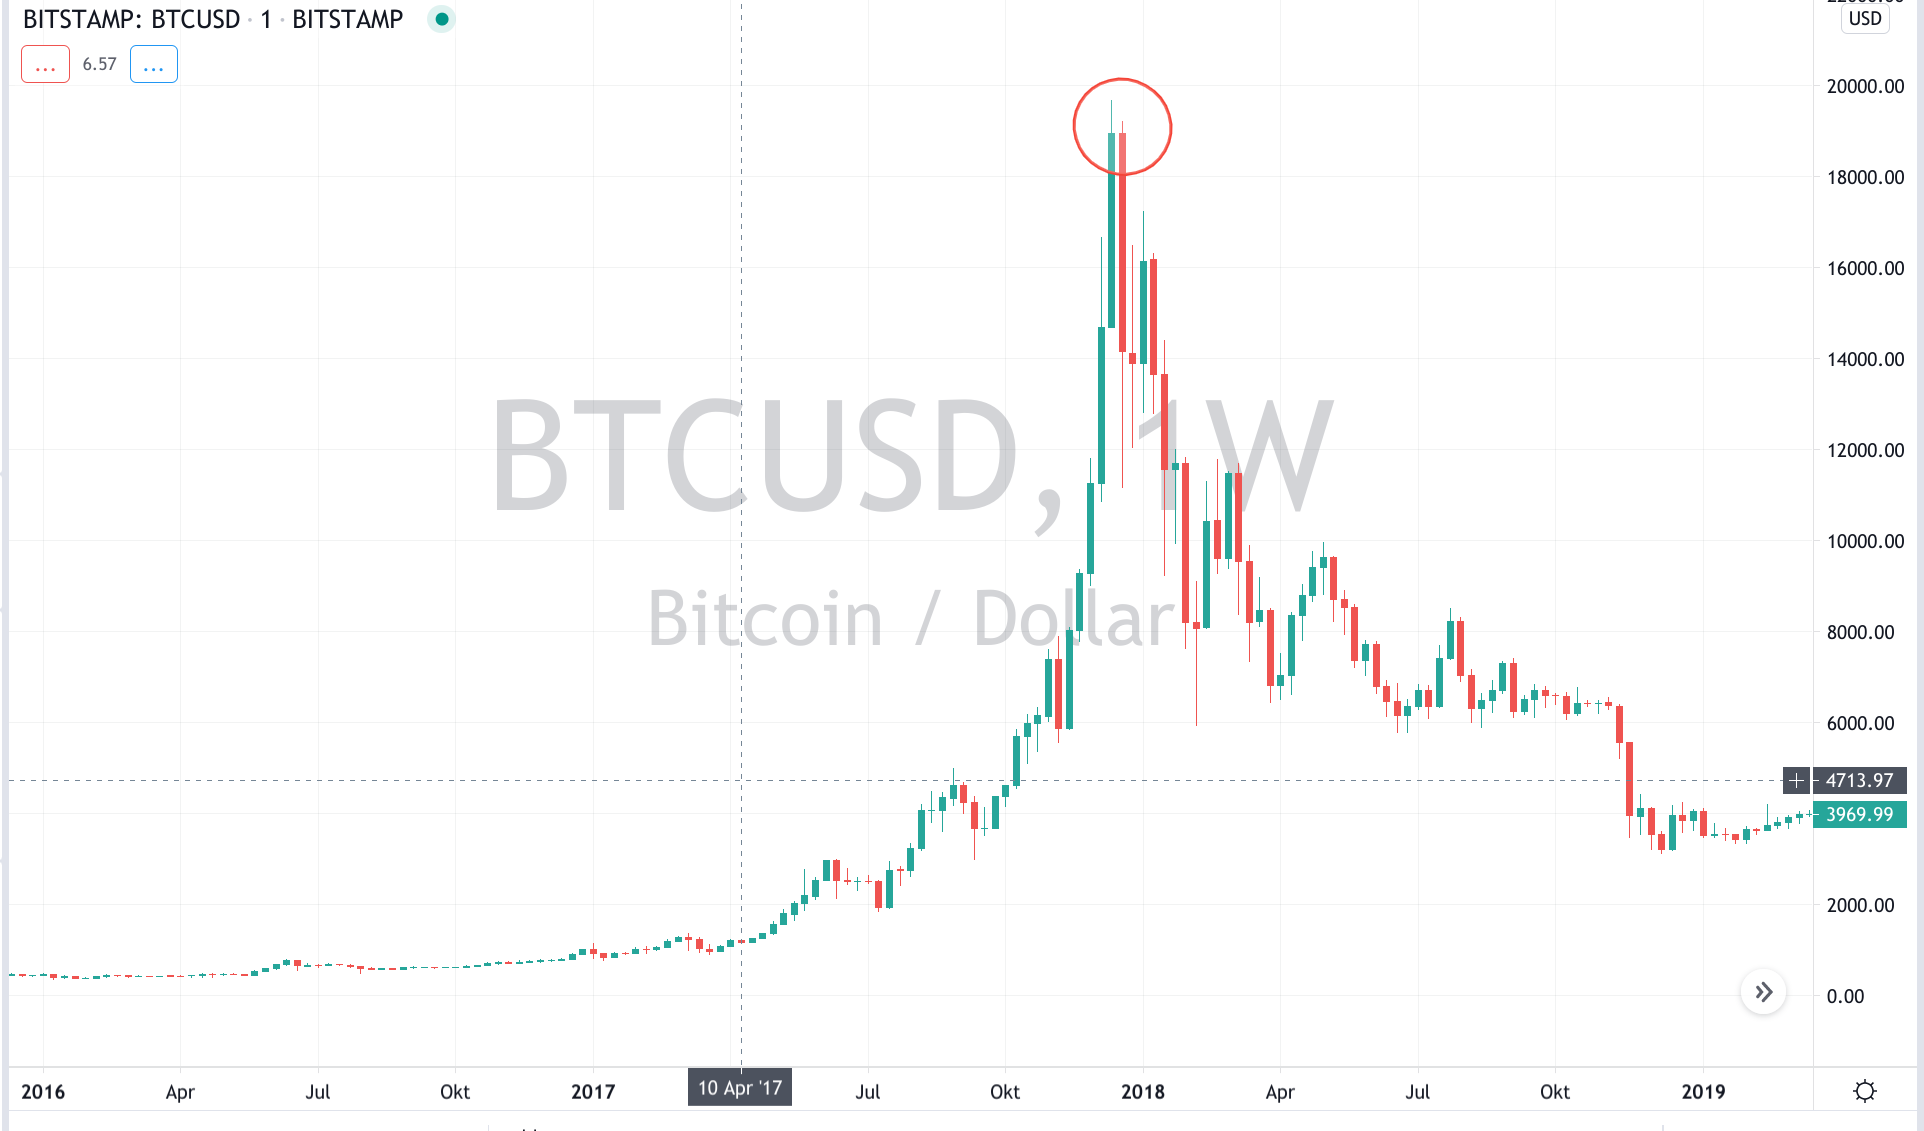 BTC/USD 1-Week chart, showing the crash of 2017